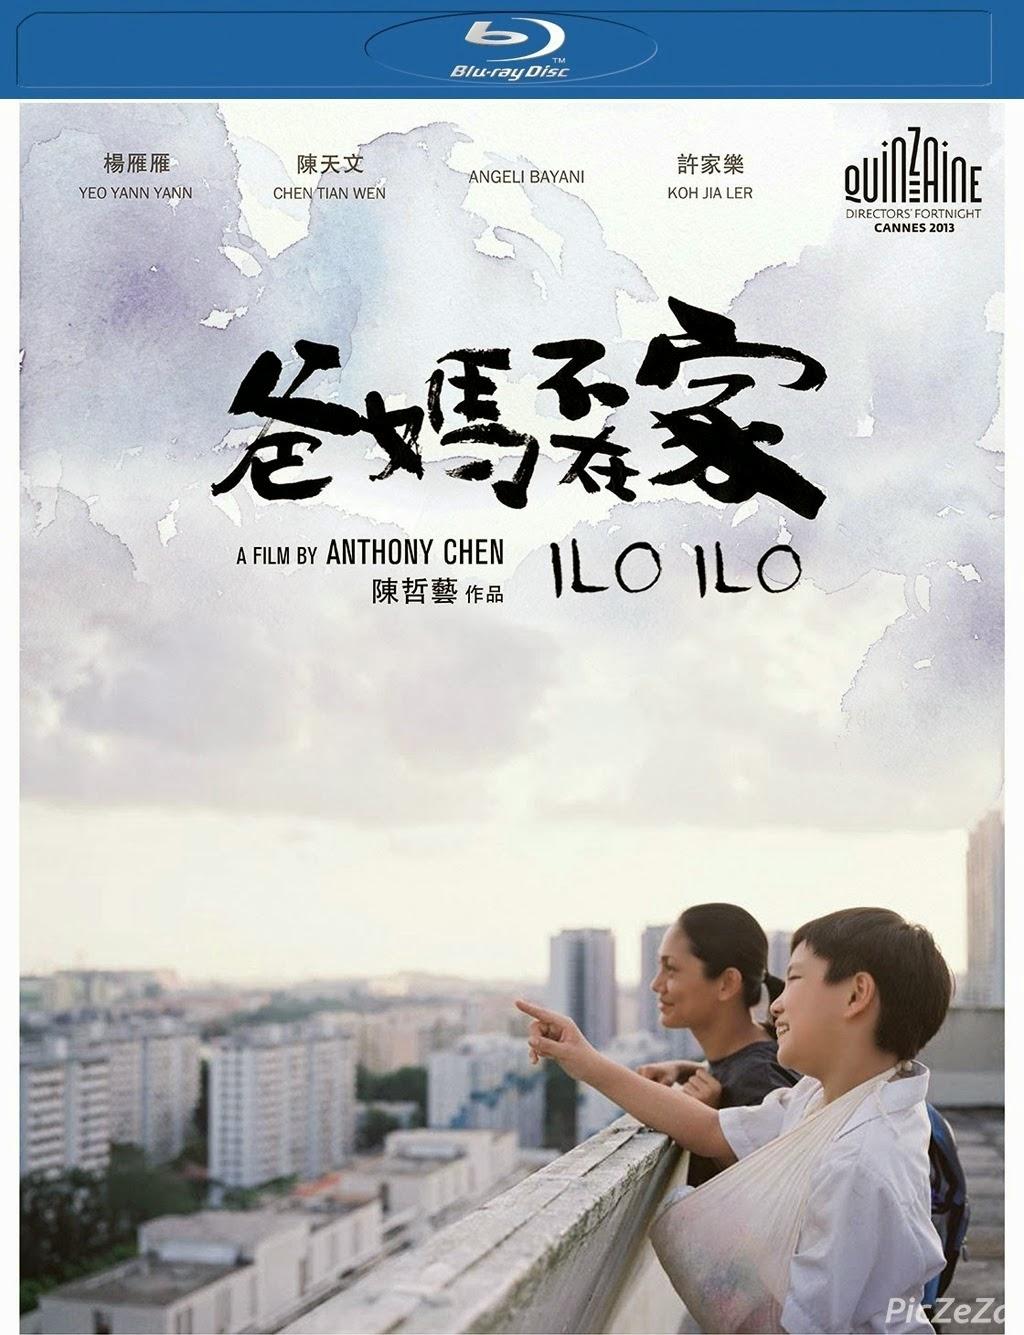 Ilo Ilo (2013) : อิโล อิโล่ เต็มไปด้วยรัก